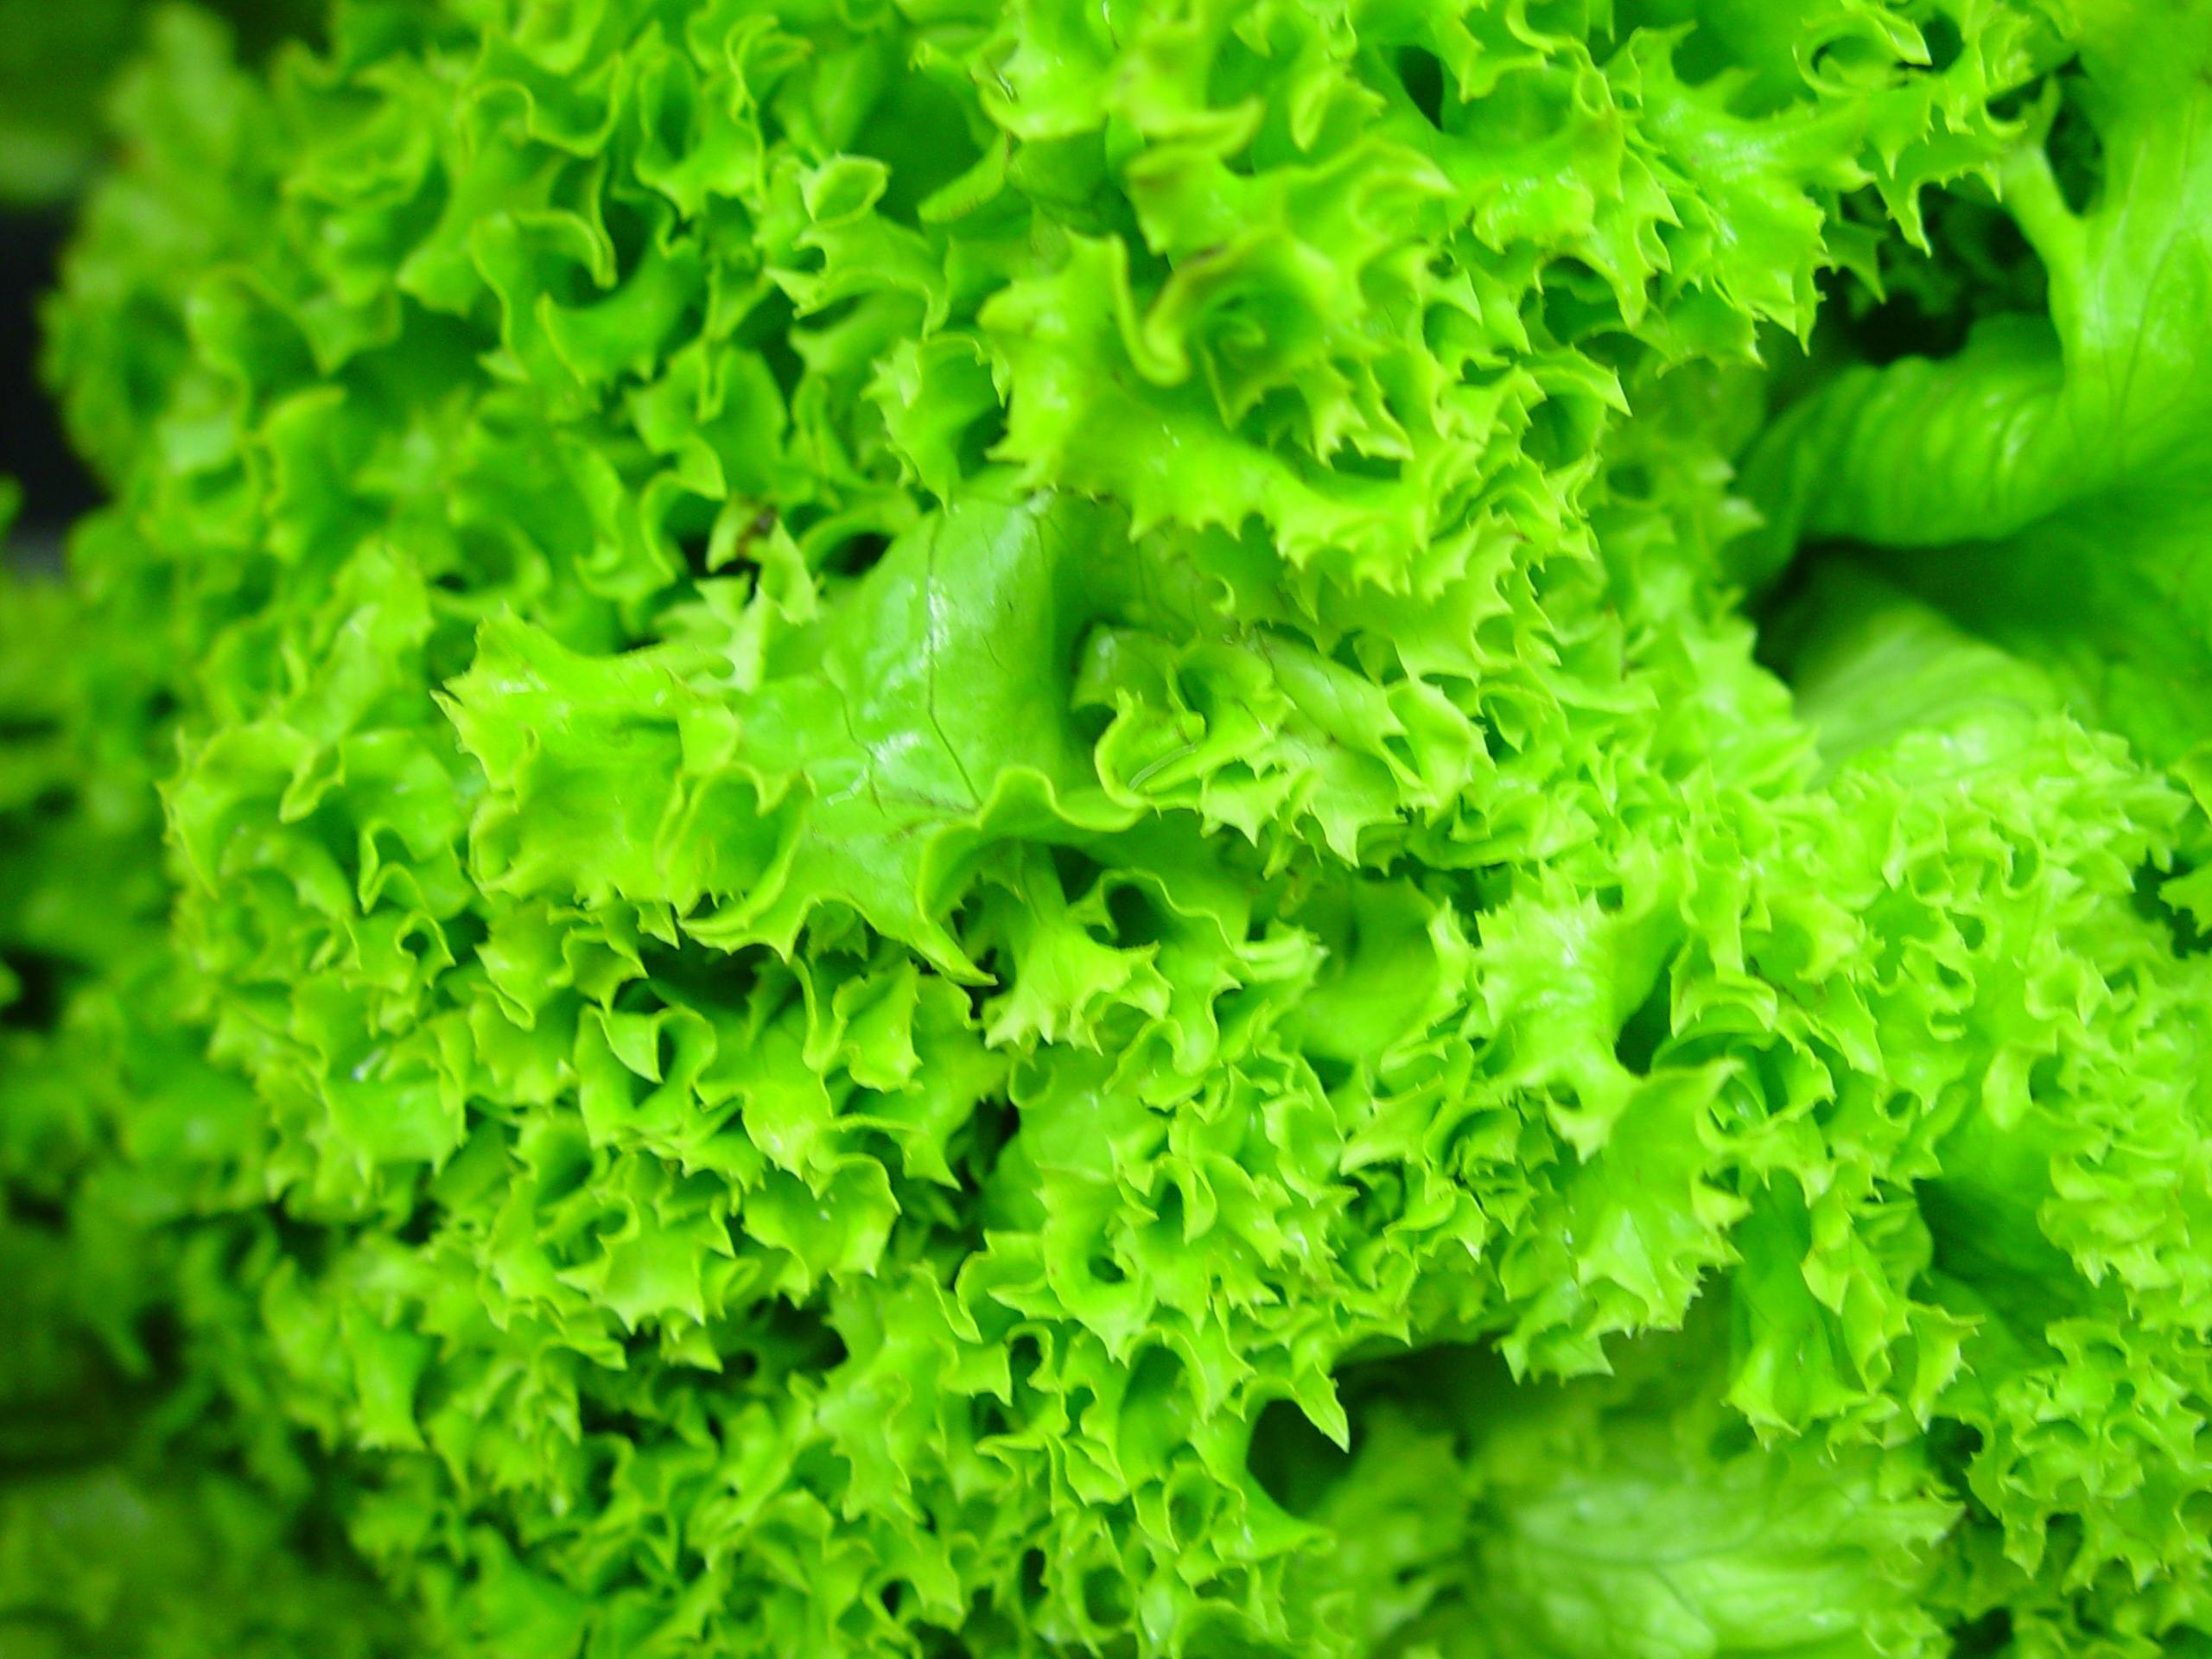 Hd Standard Wallpaper Free Picture Hydroponic Lettuce Leaves Green